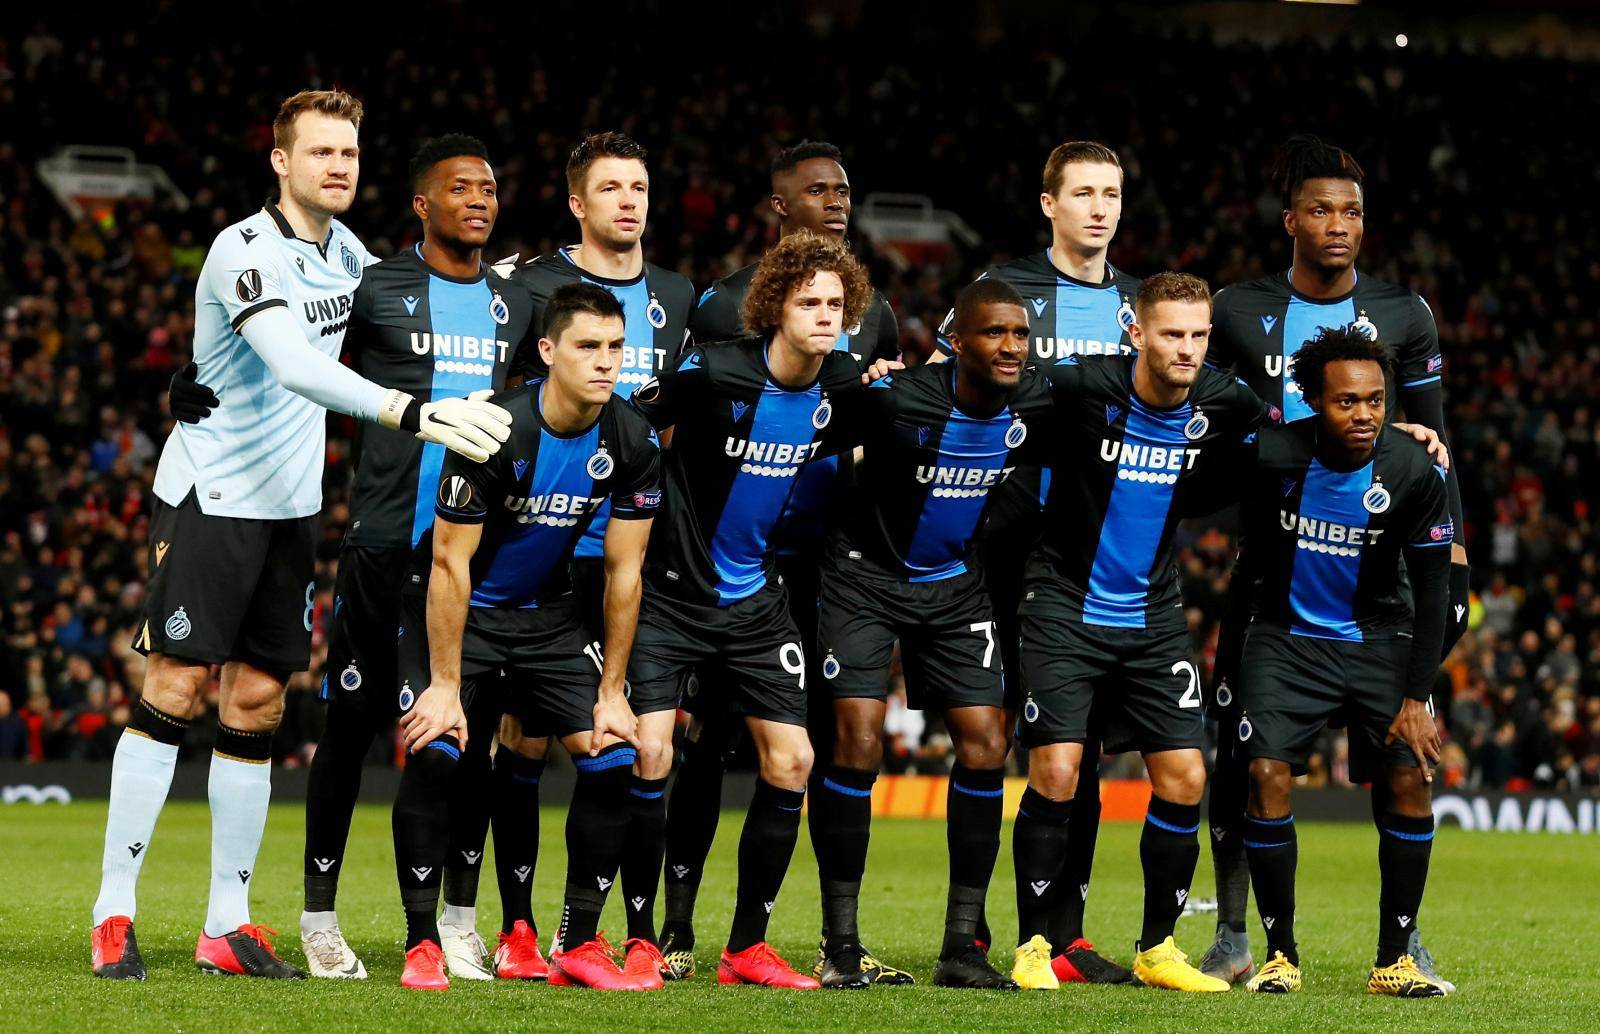 FILE PHOTO: FILE PHOTO: Europa League - Round of 32 Second Leg - Manchester United v Club Brugge